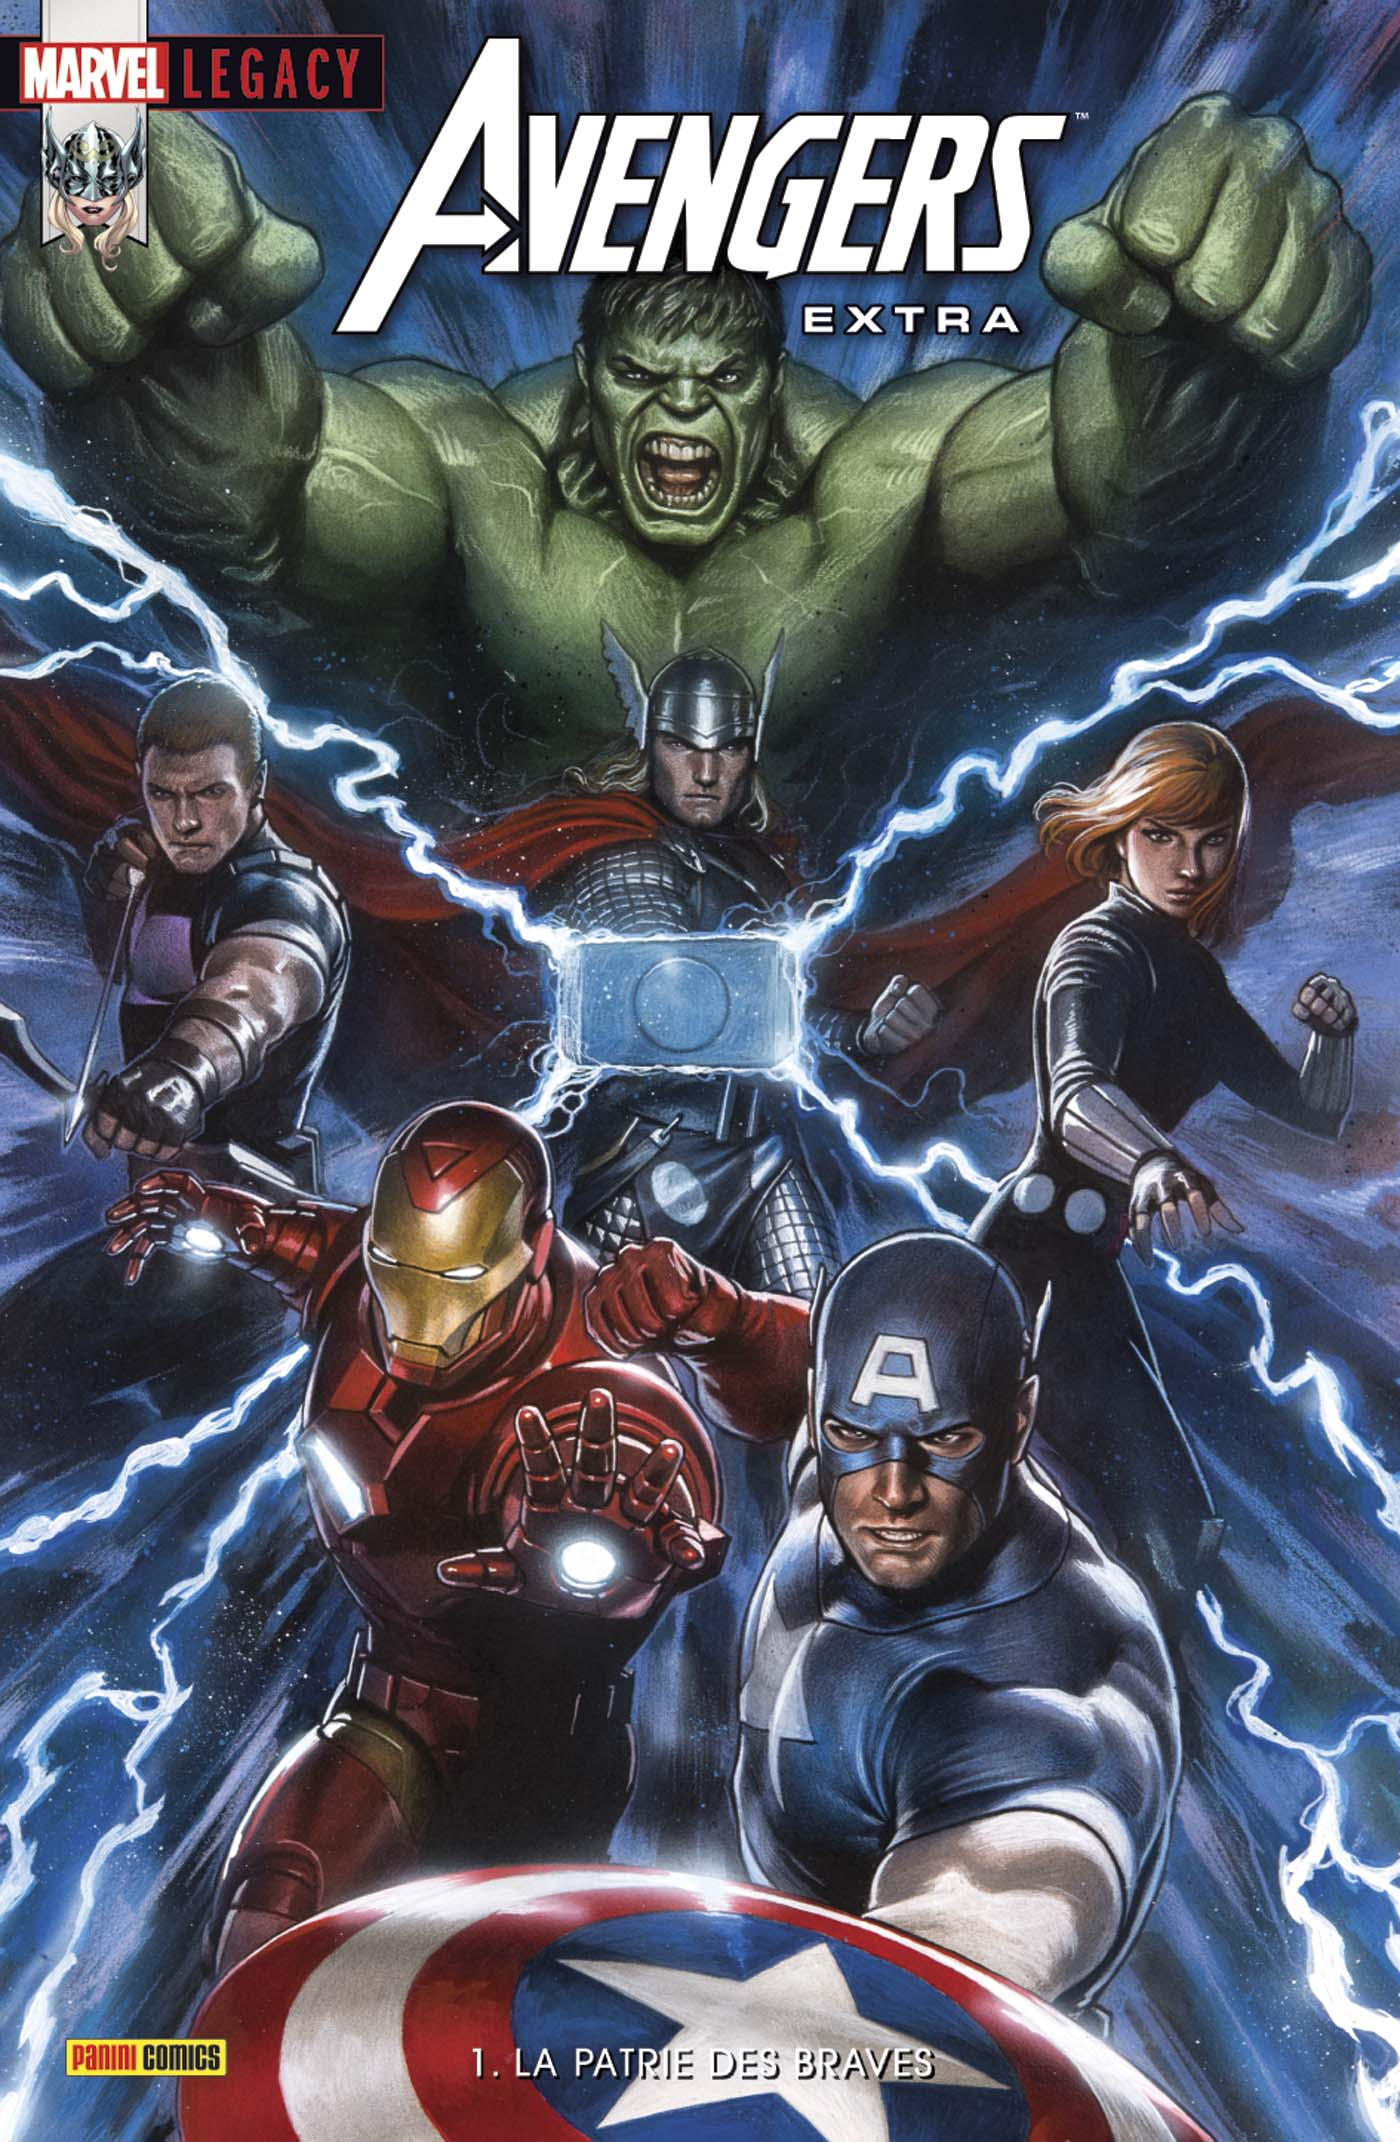 Marvel Legacy - Avengers Extra 1 - La Patrie des Braves